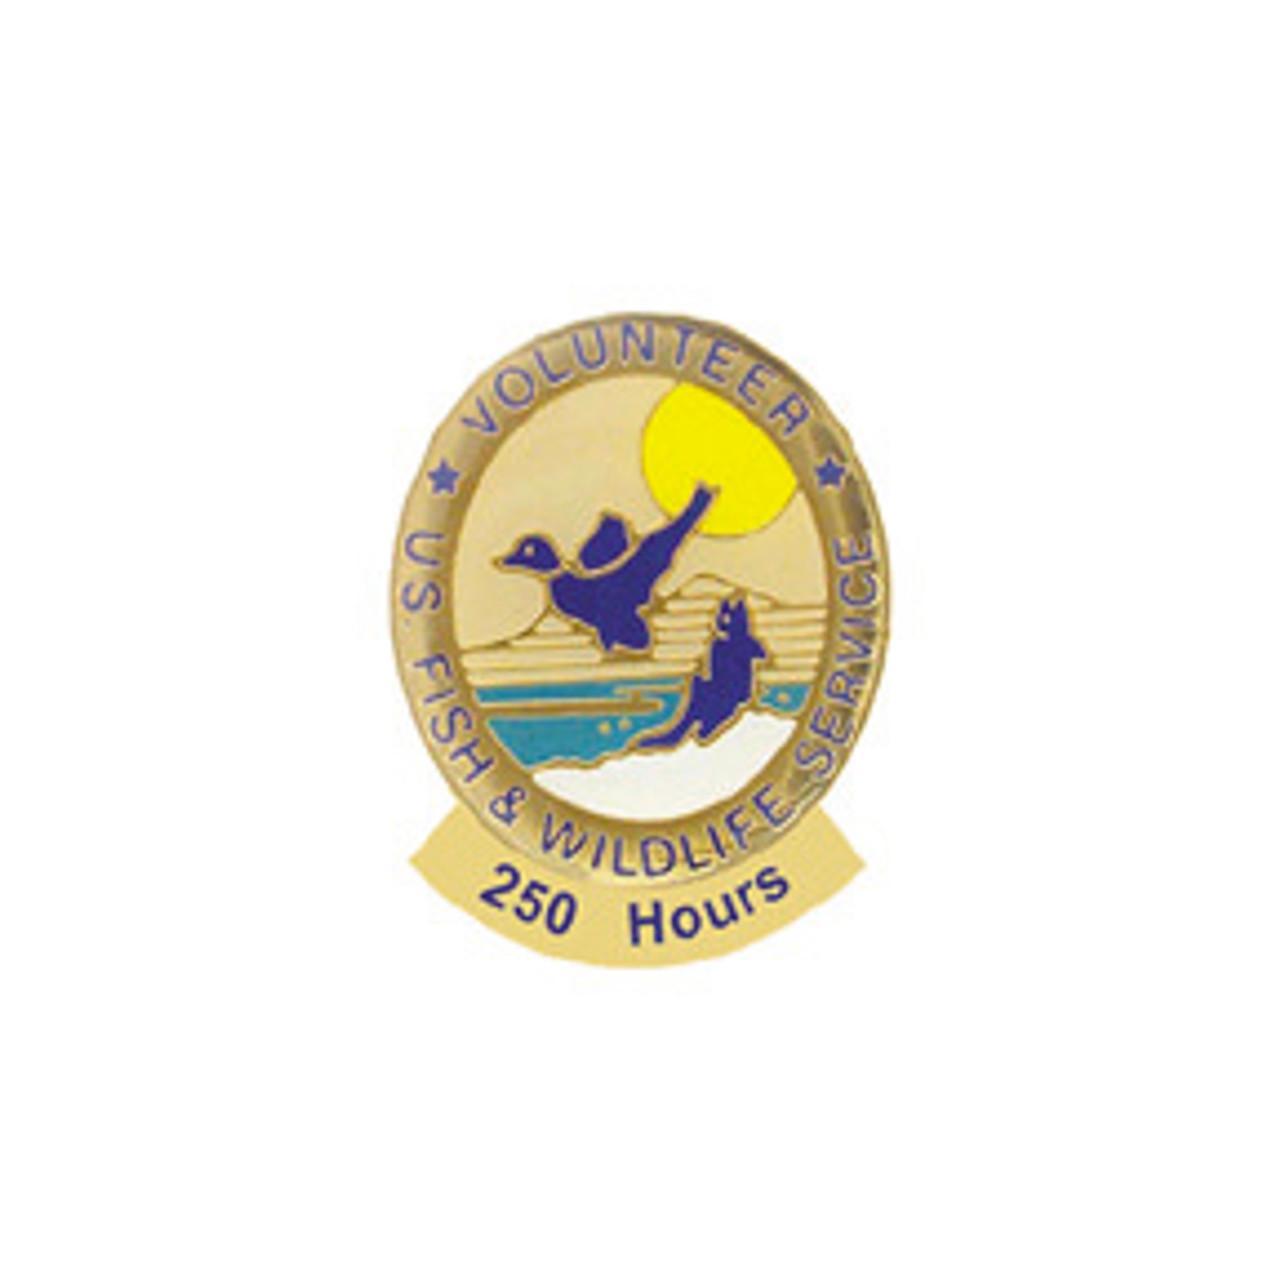 Fish & Wildlife Volunteer Hours Pin (4000 hours)